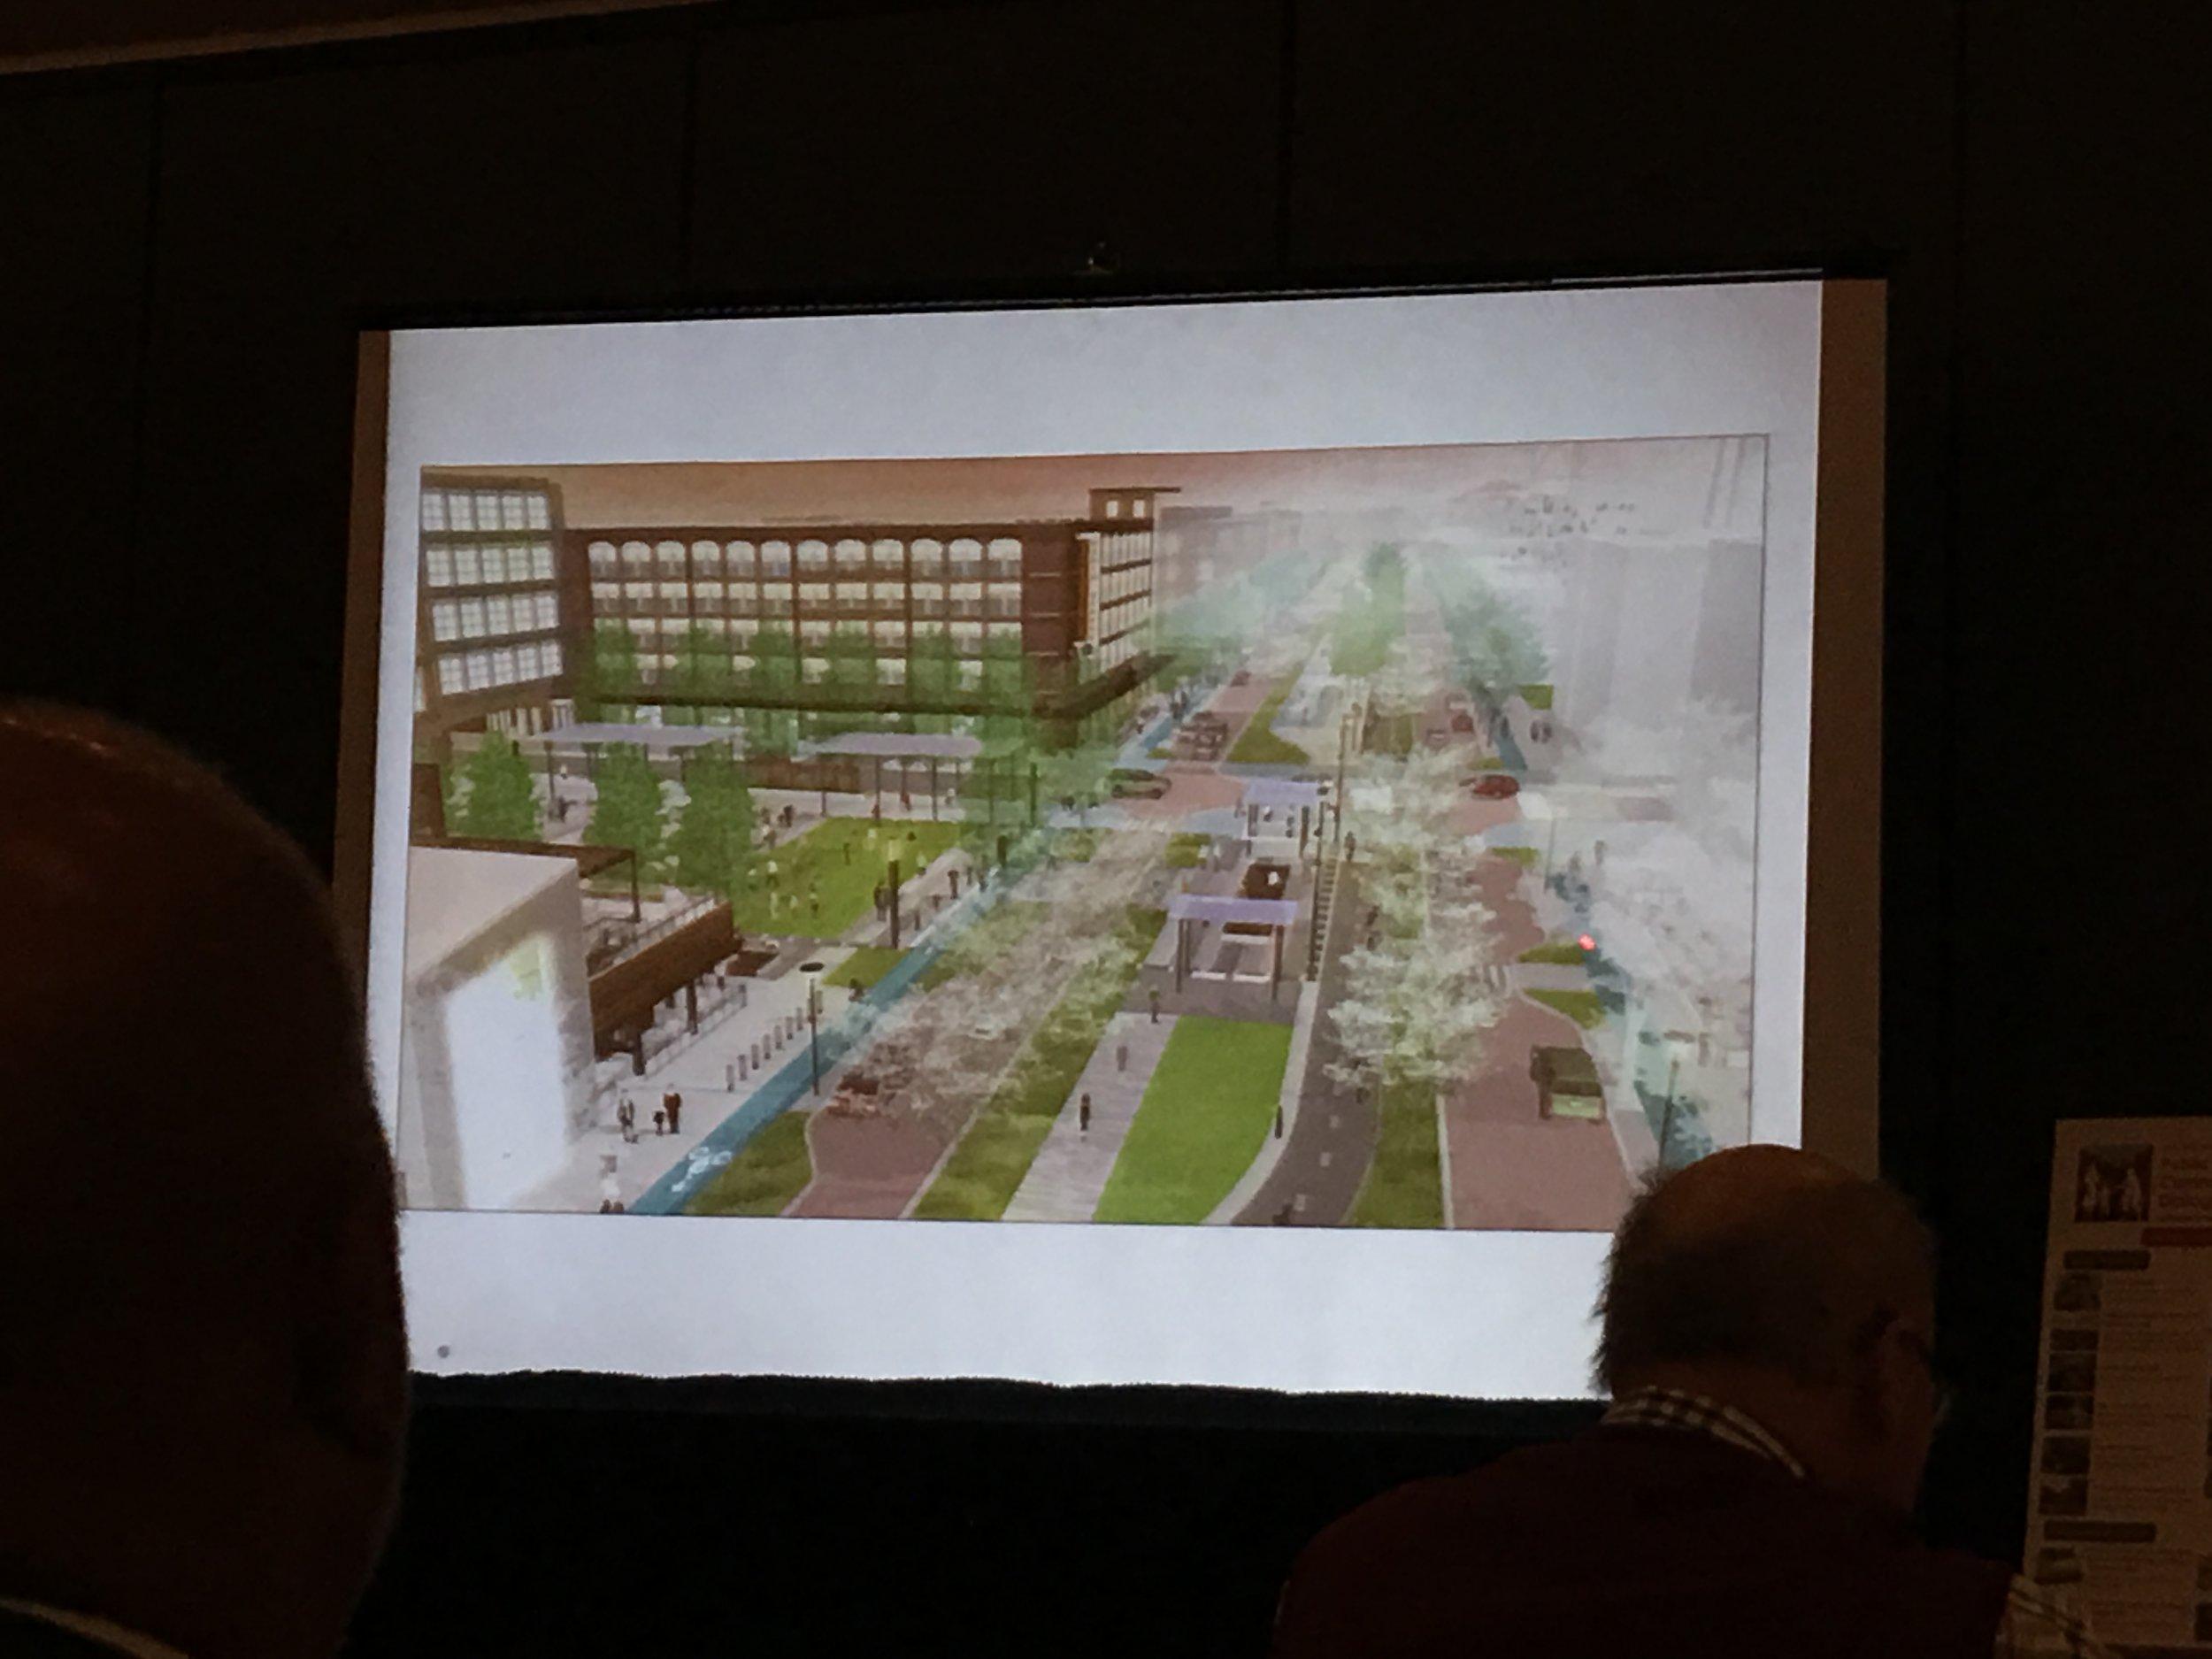 Slide showing Carmel, Indiana's new street design